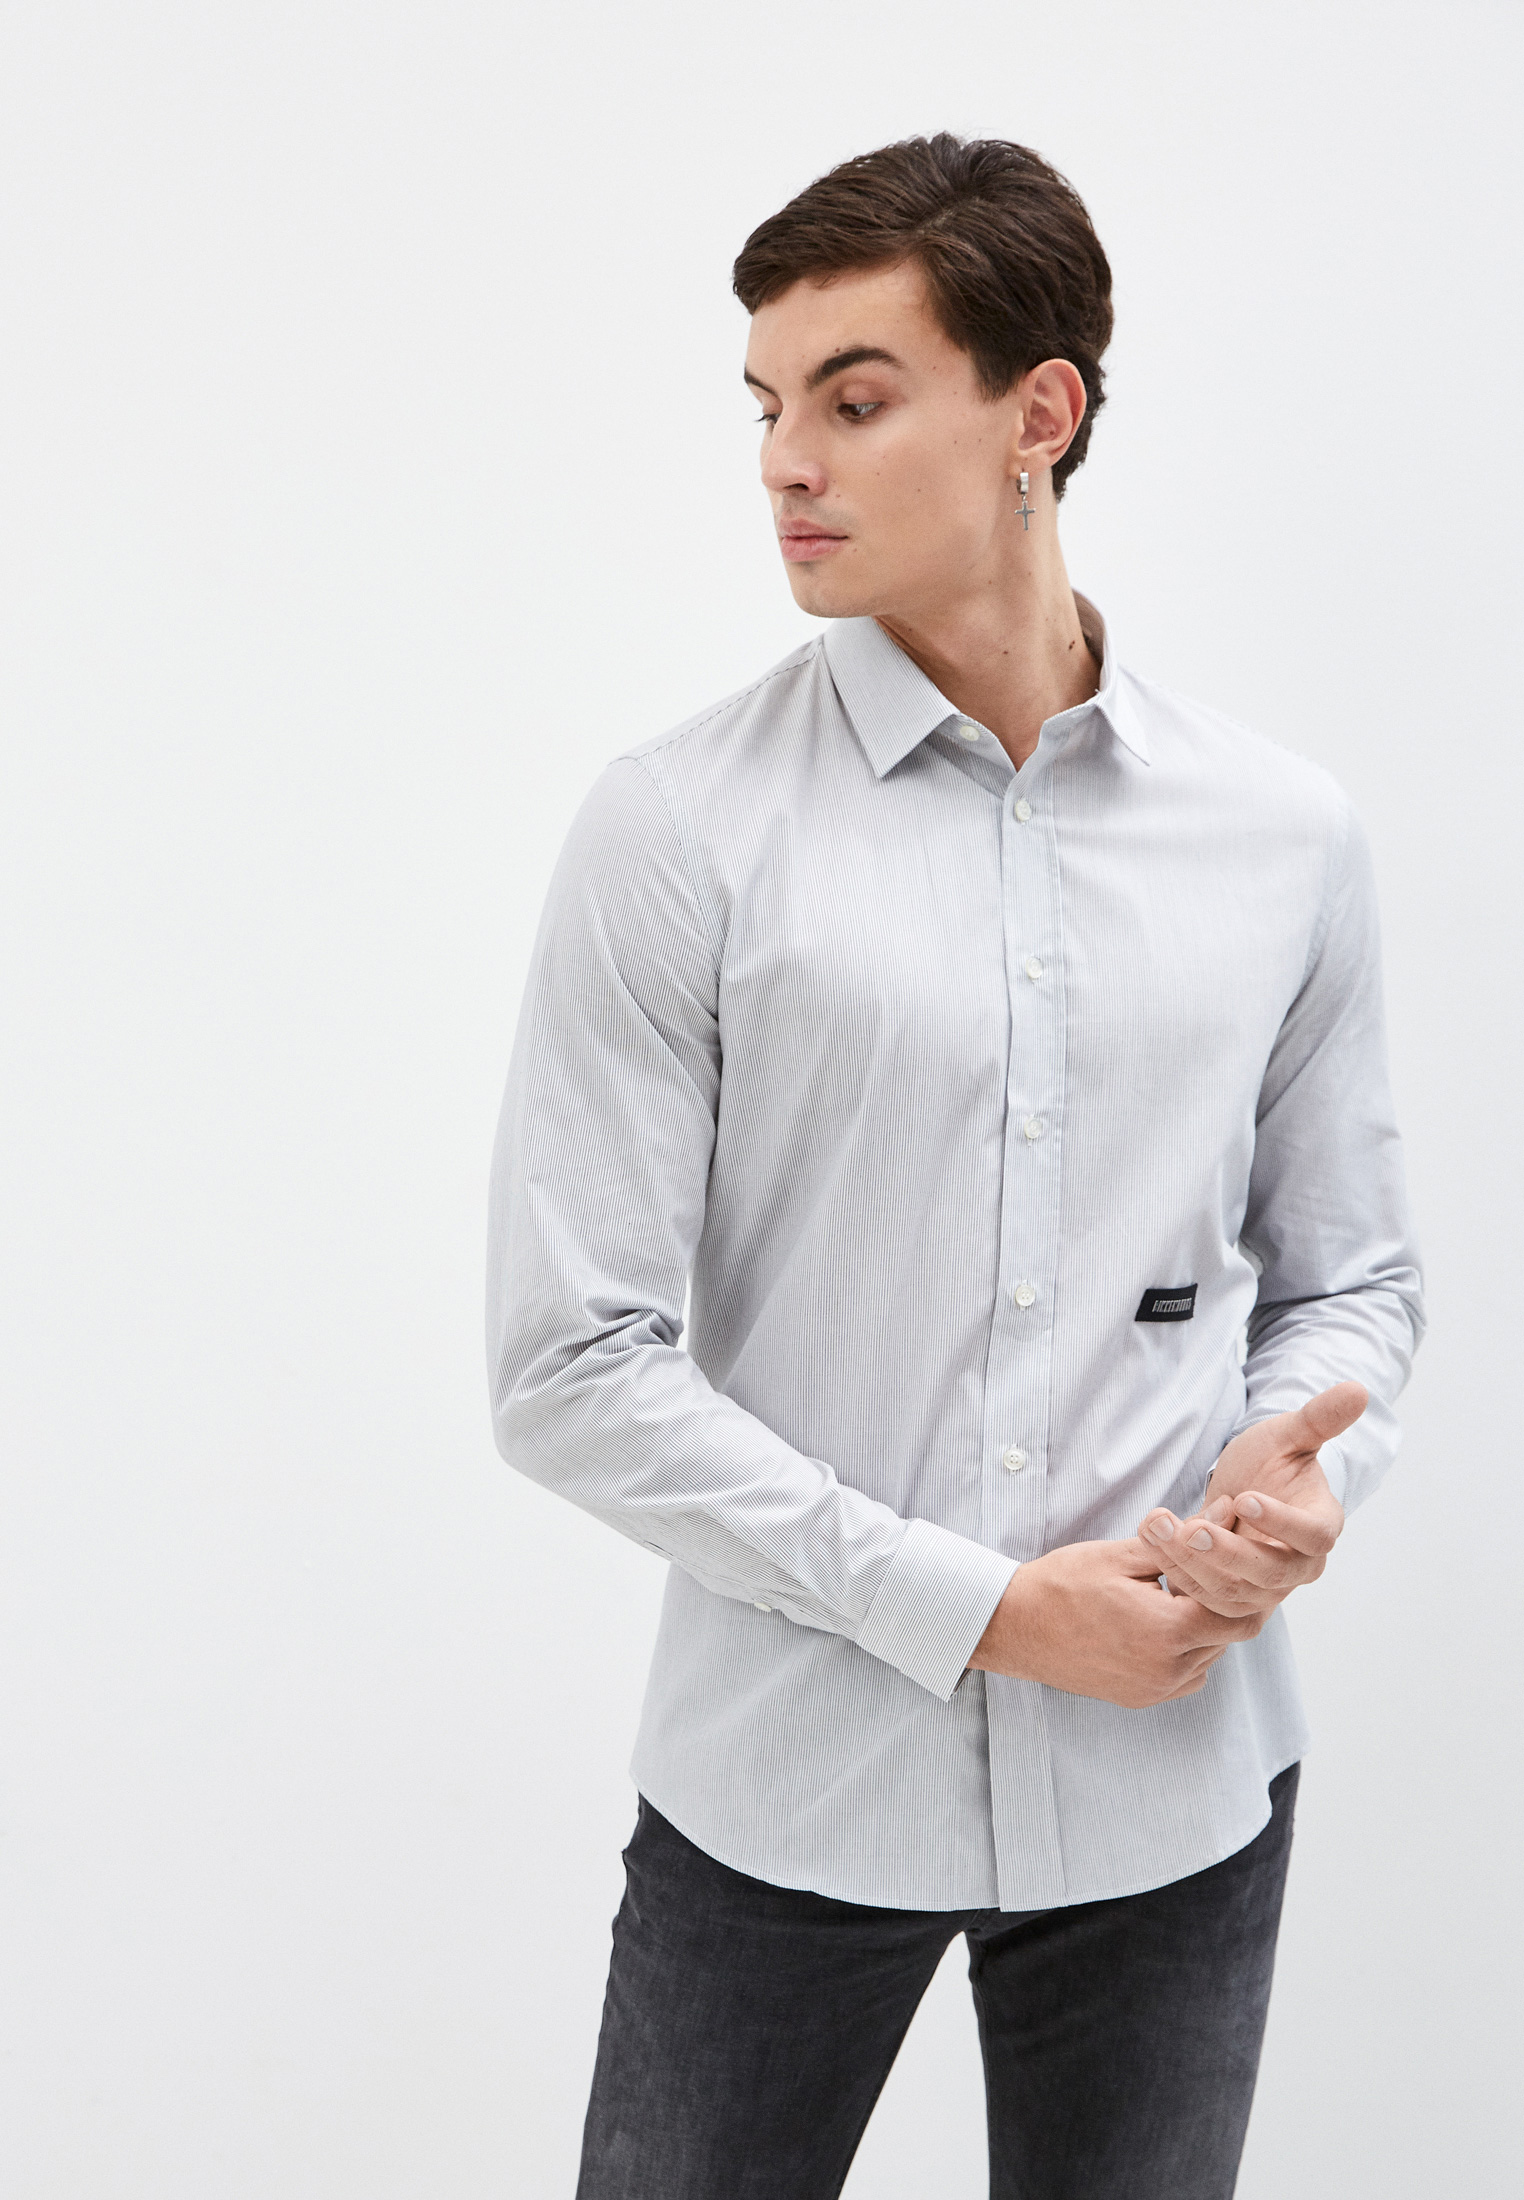 Рубашка с длинным рукавом Bikkembergs (Биккембергс) C C 009 81 T 016A